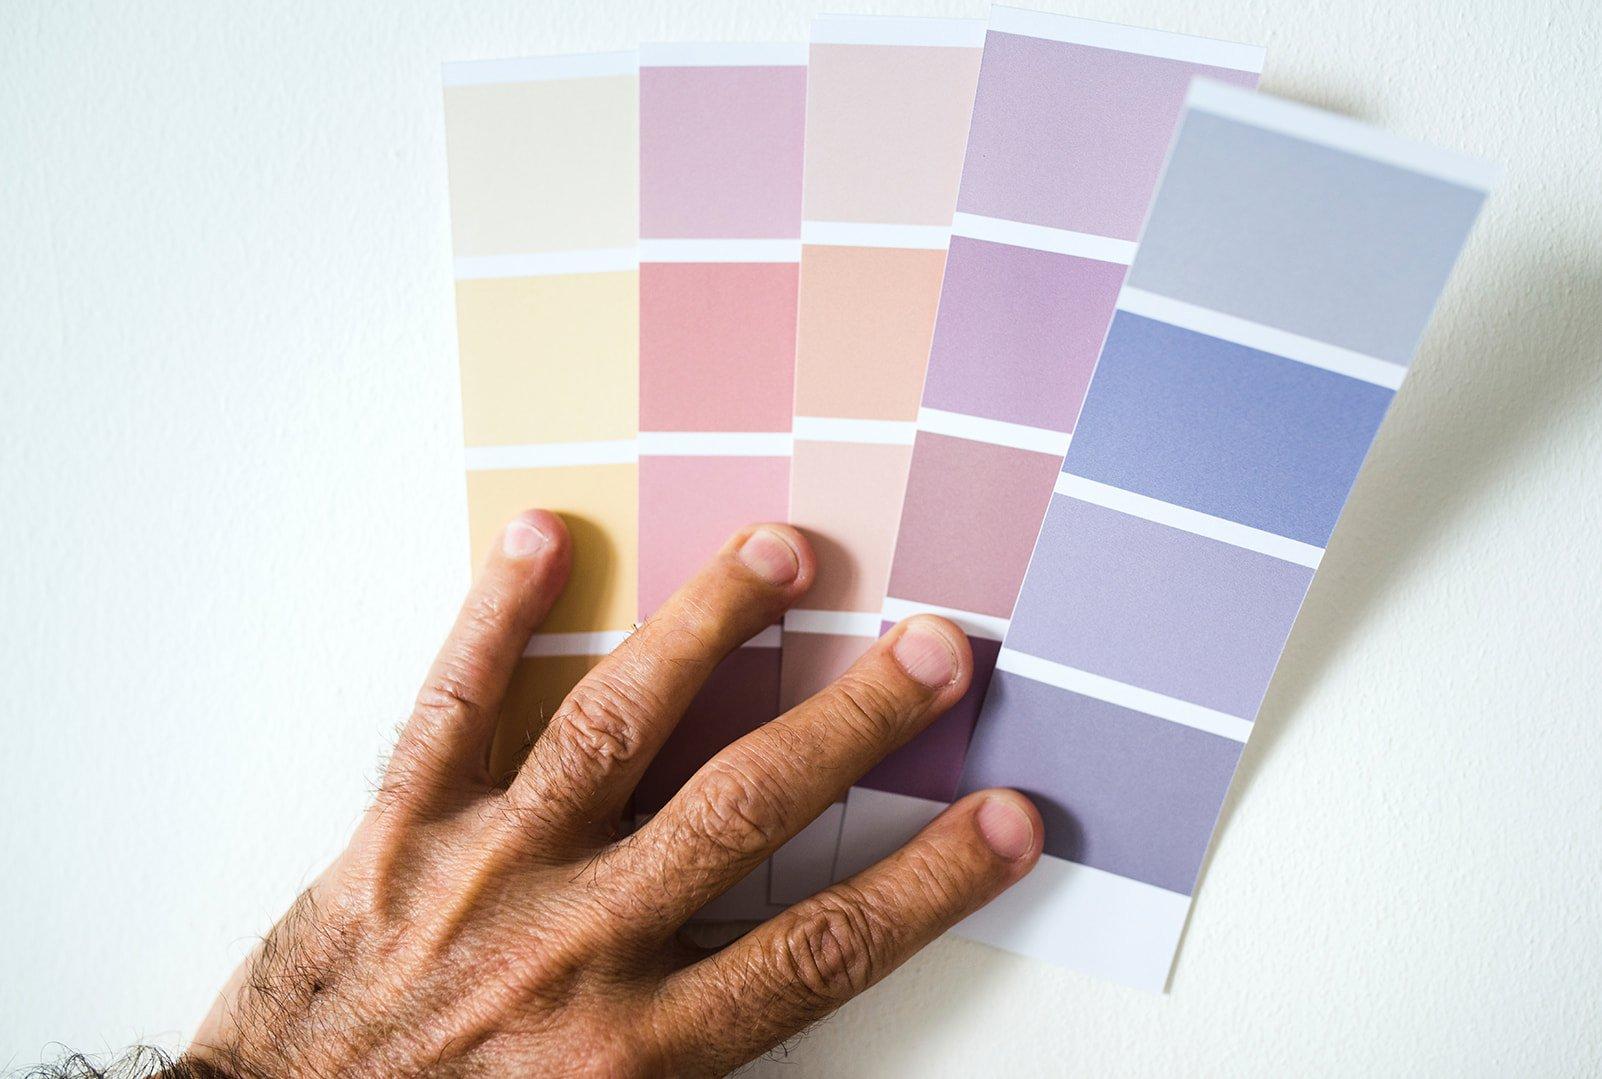 Bedroom Decoration Tips- Choosing Pastel Colors